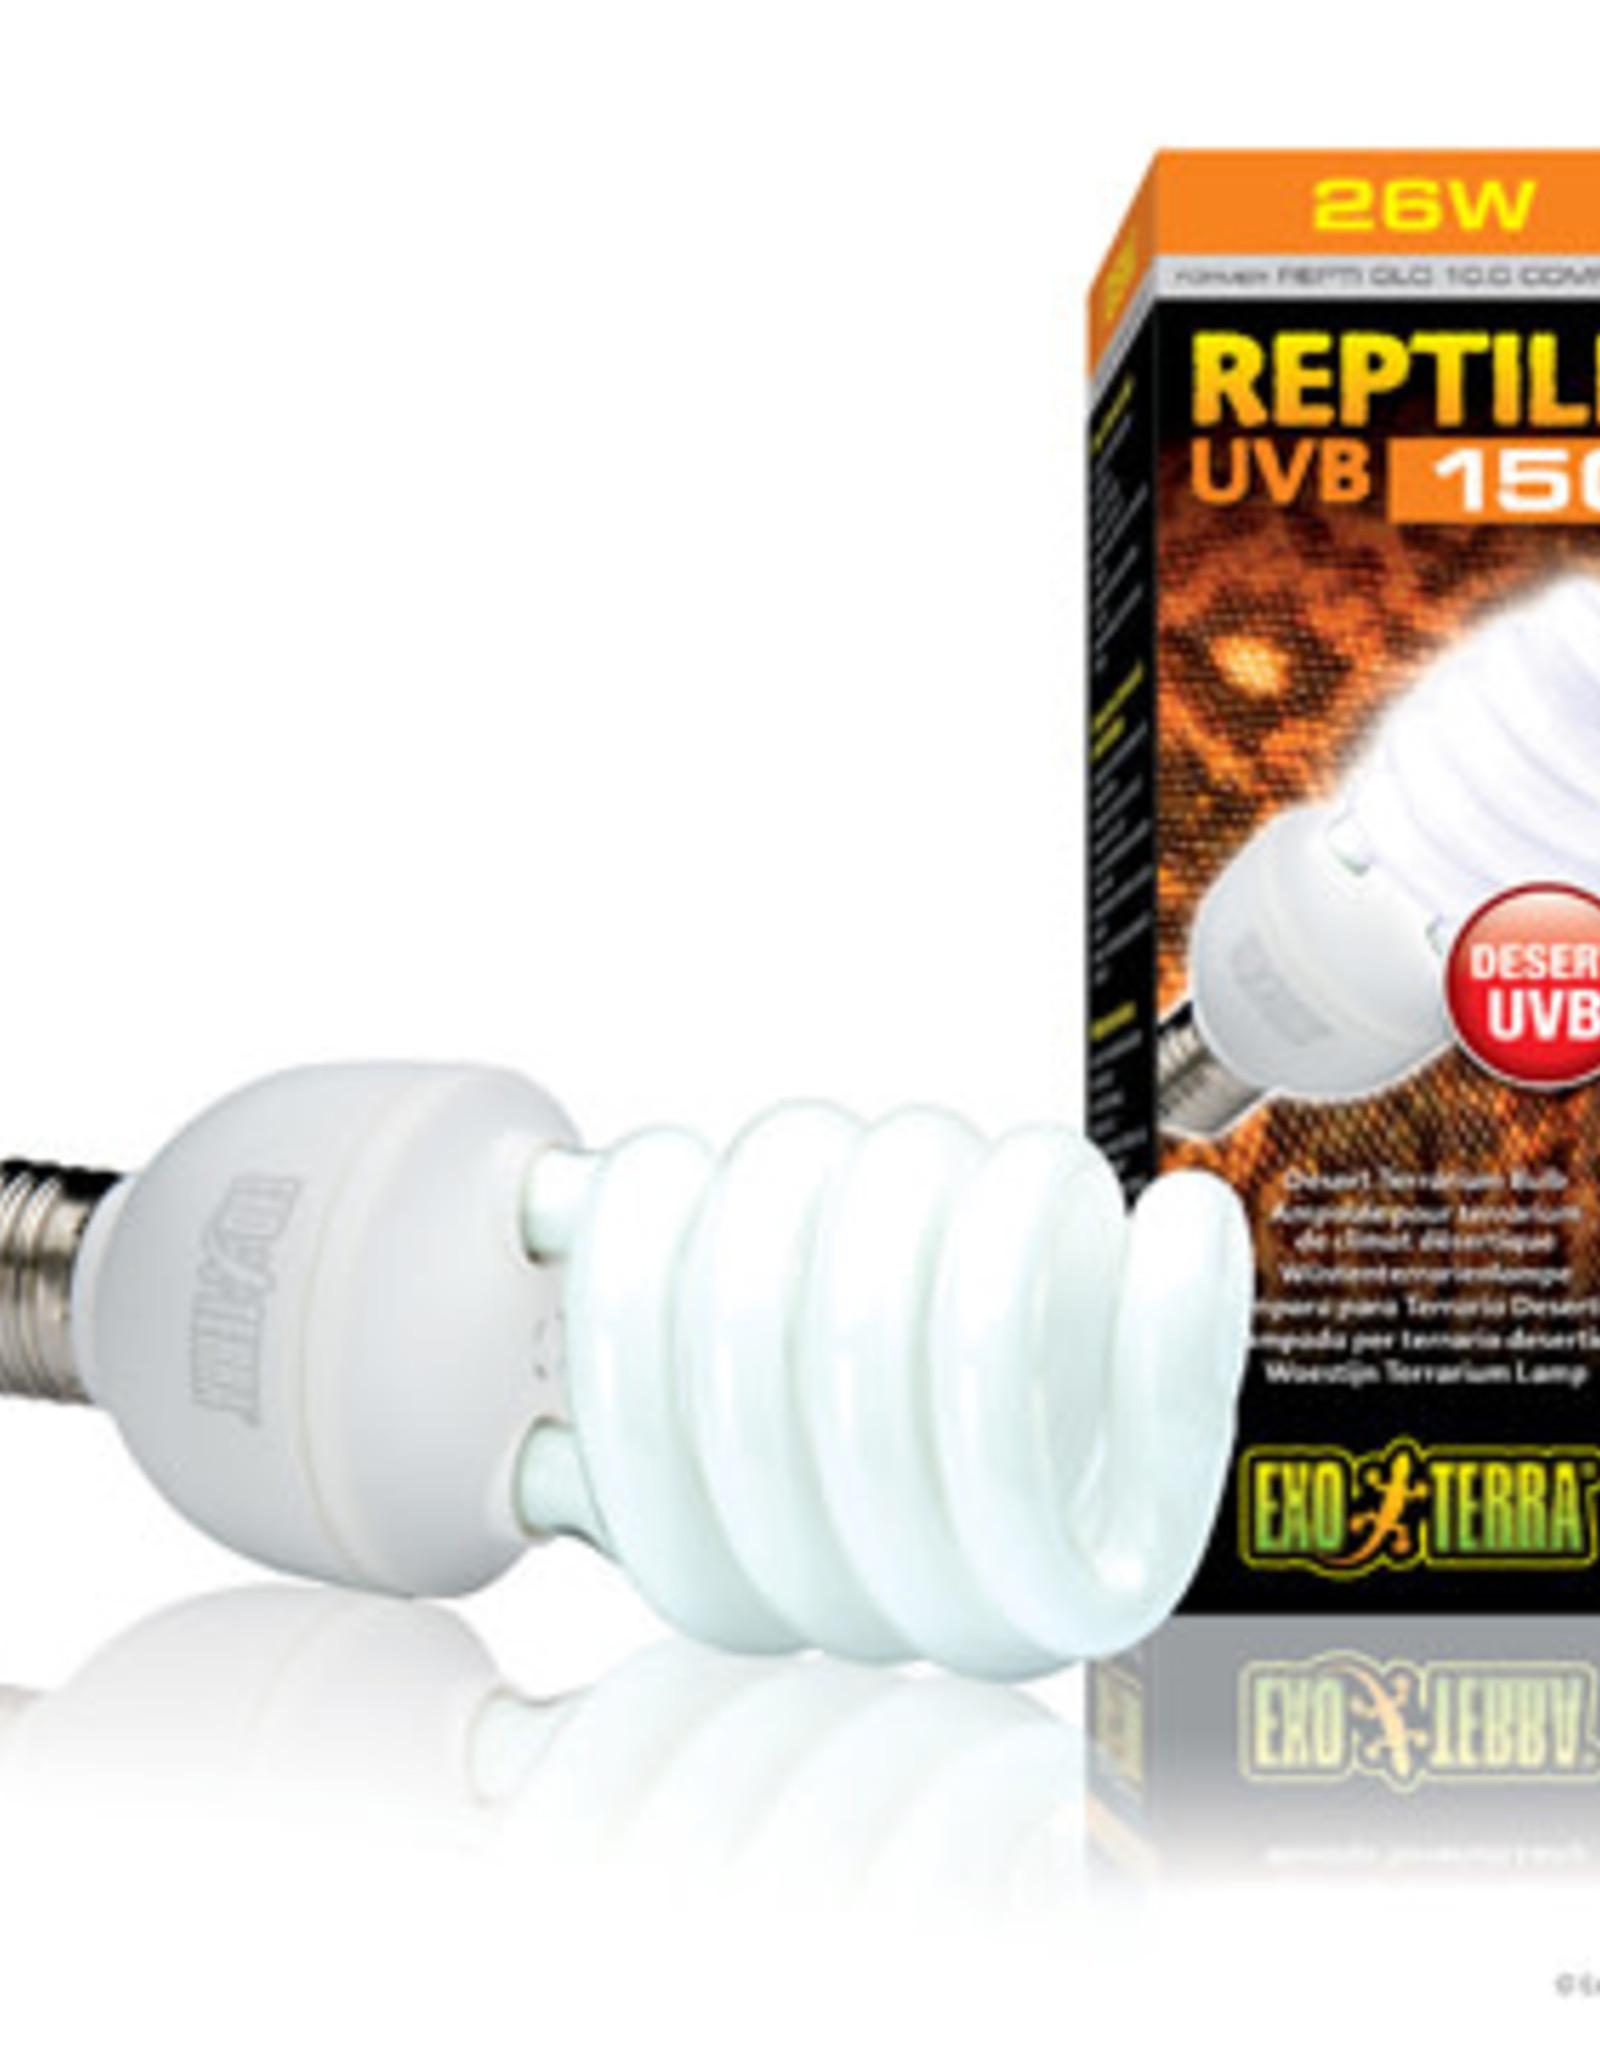 EXO-TERRA Exo Terra Reptile UVB150 - 26 W